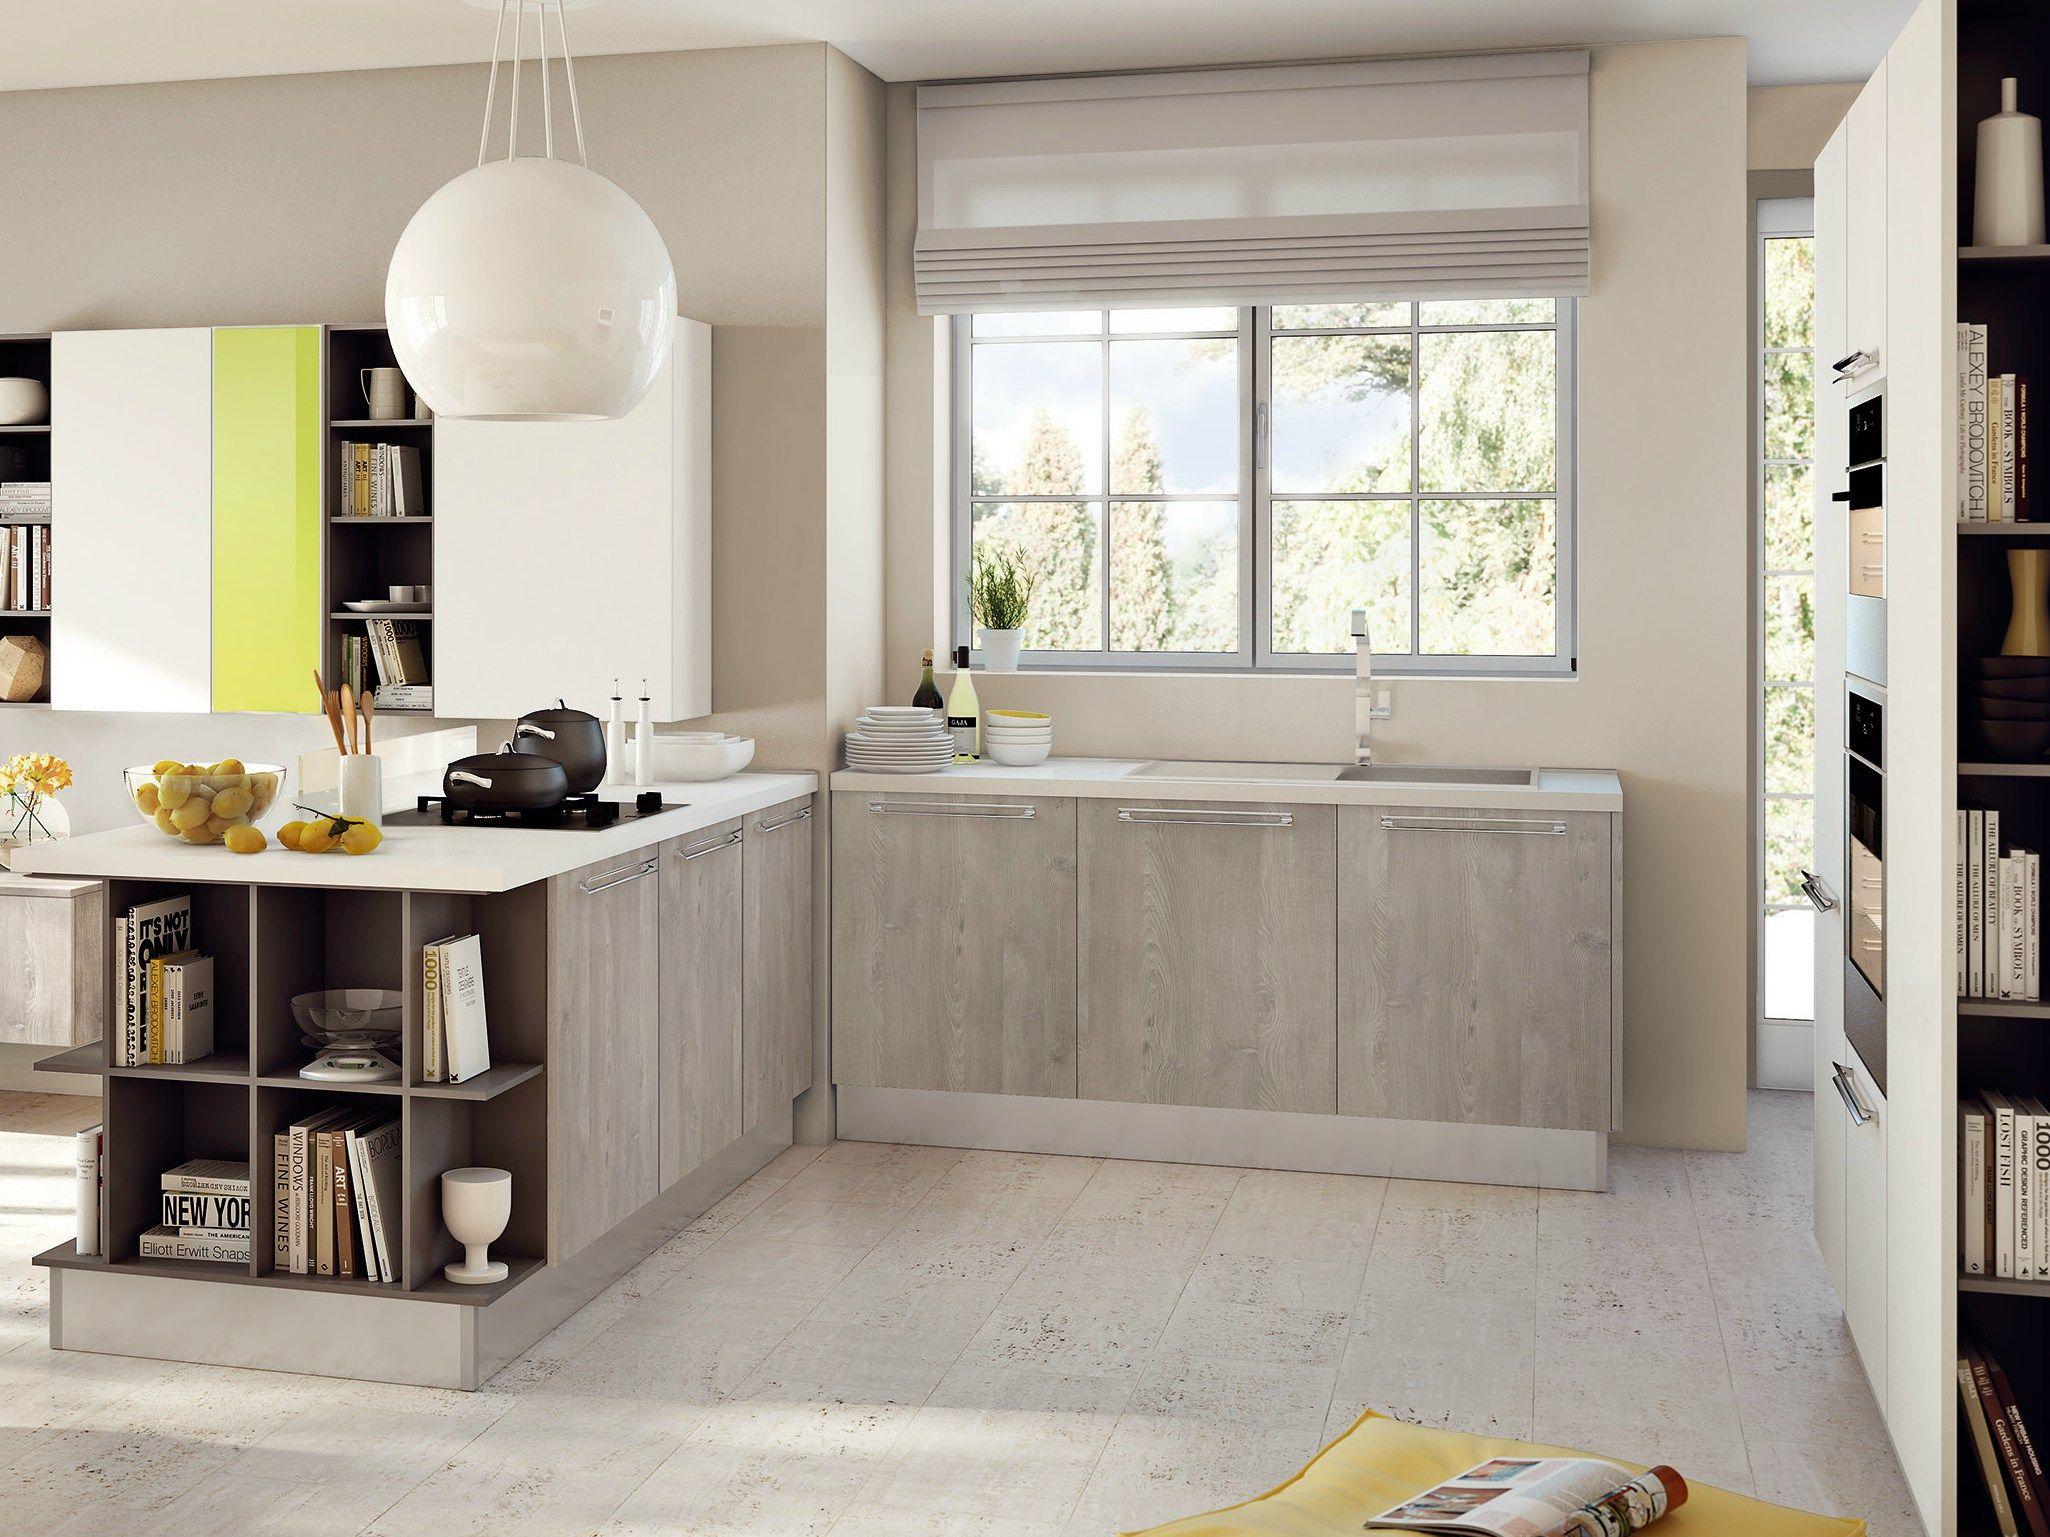 SWING Cucina by Cucine Lube